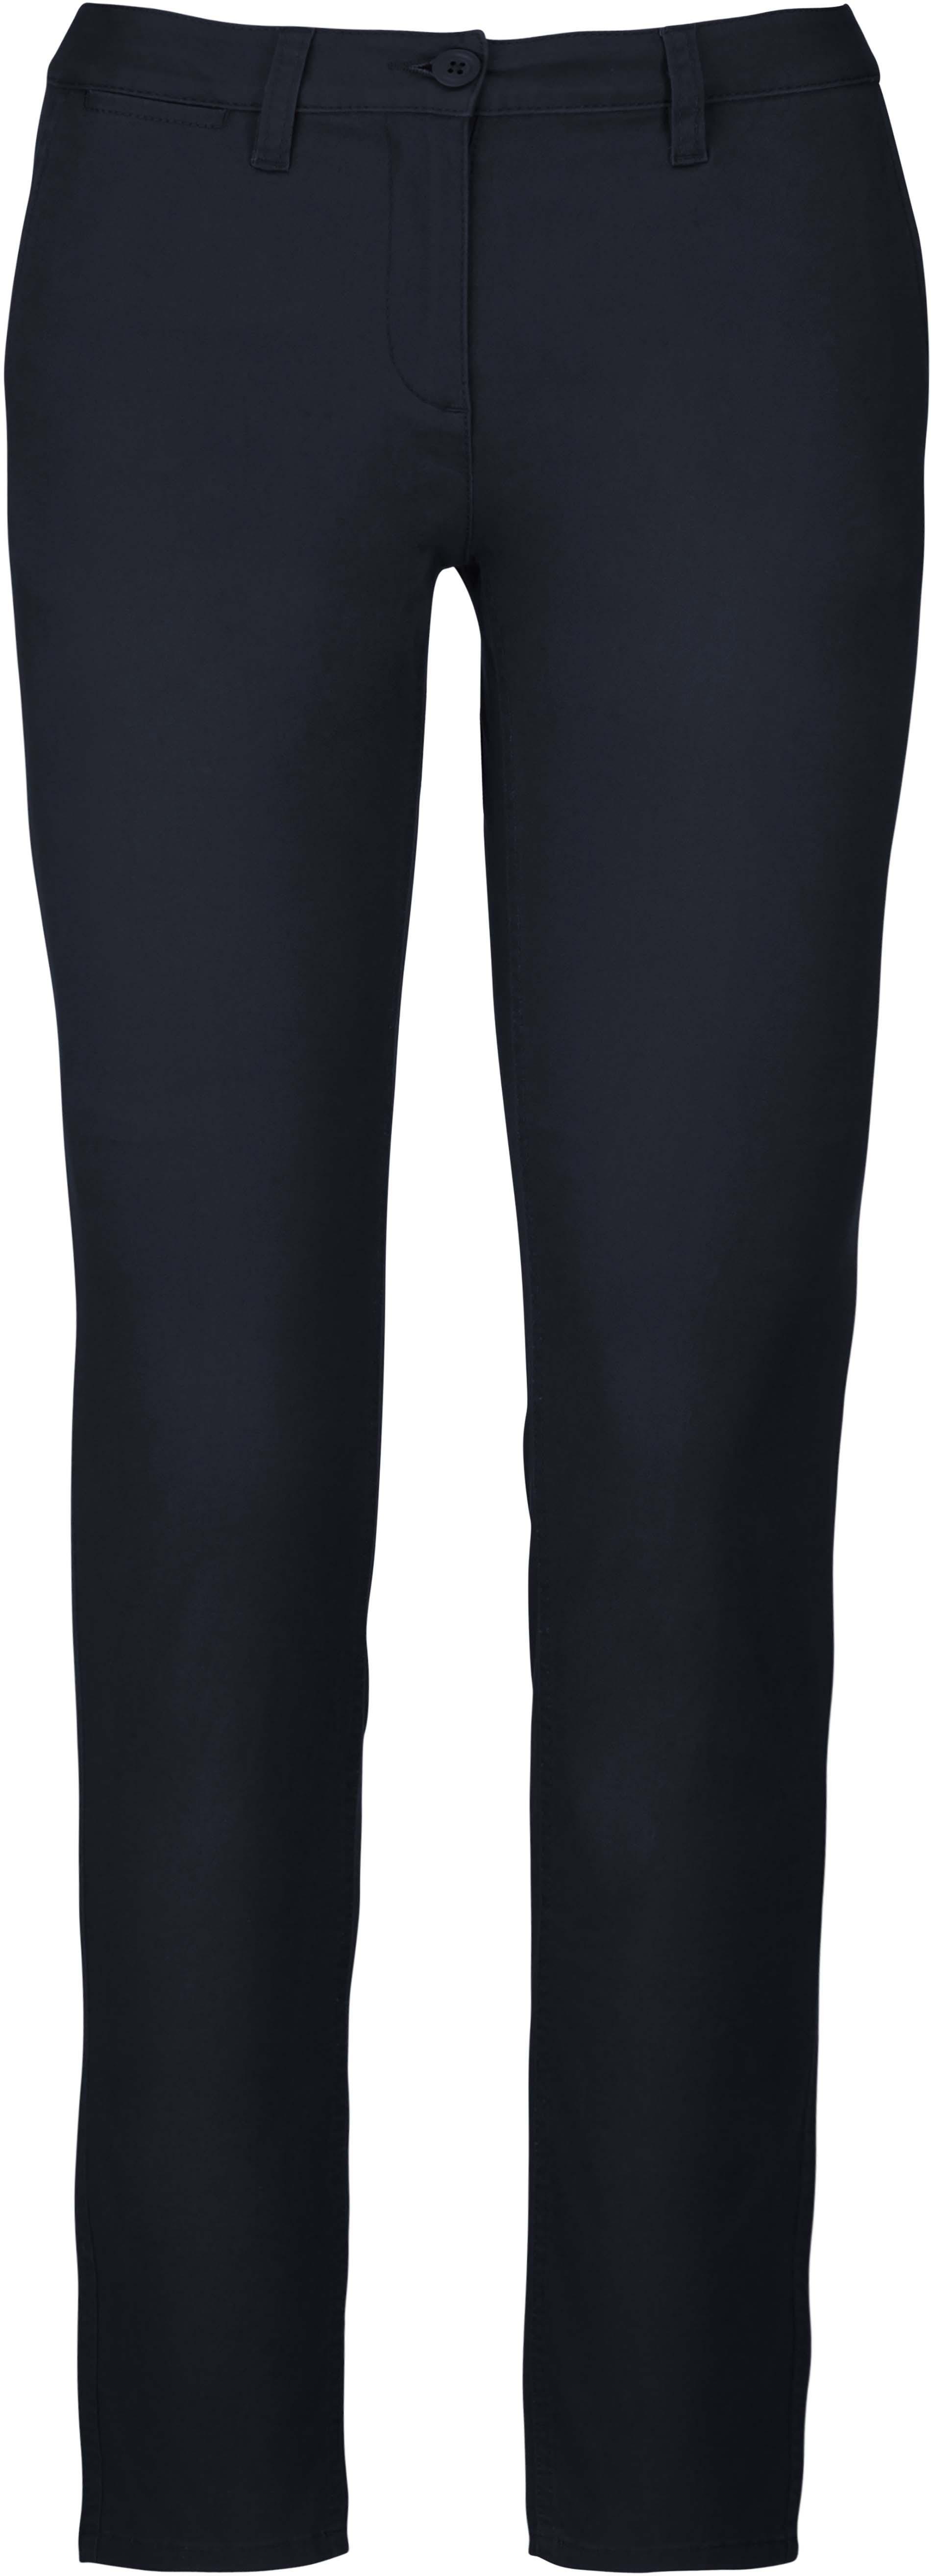 Pantalon chino femme - 2-1479-13